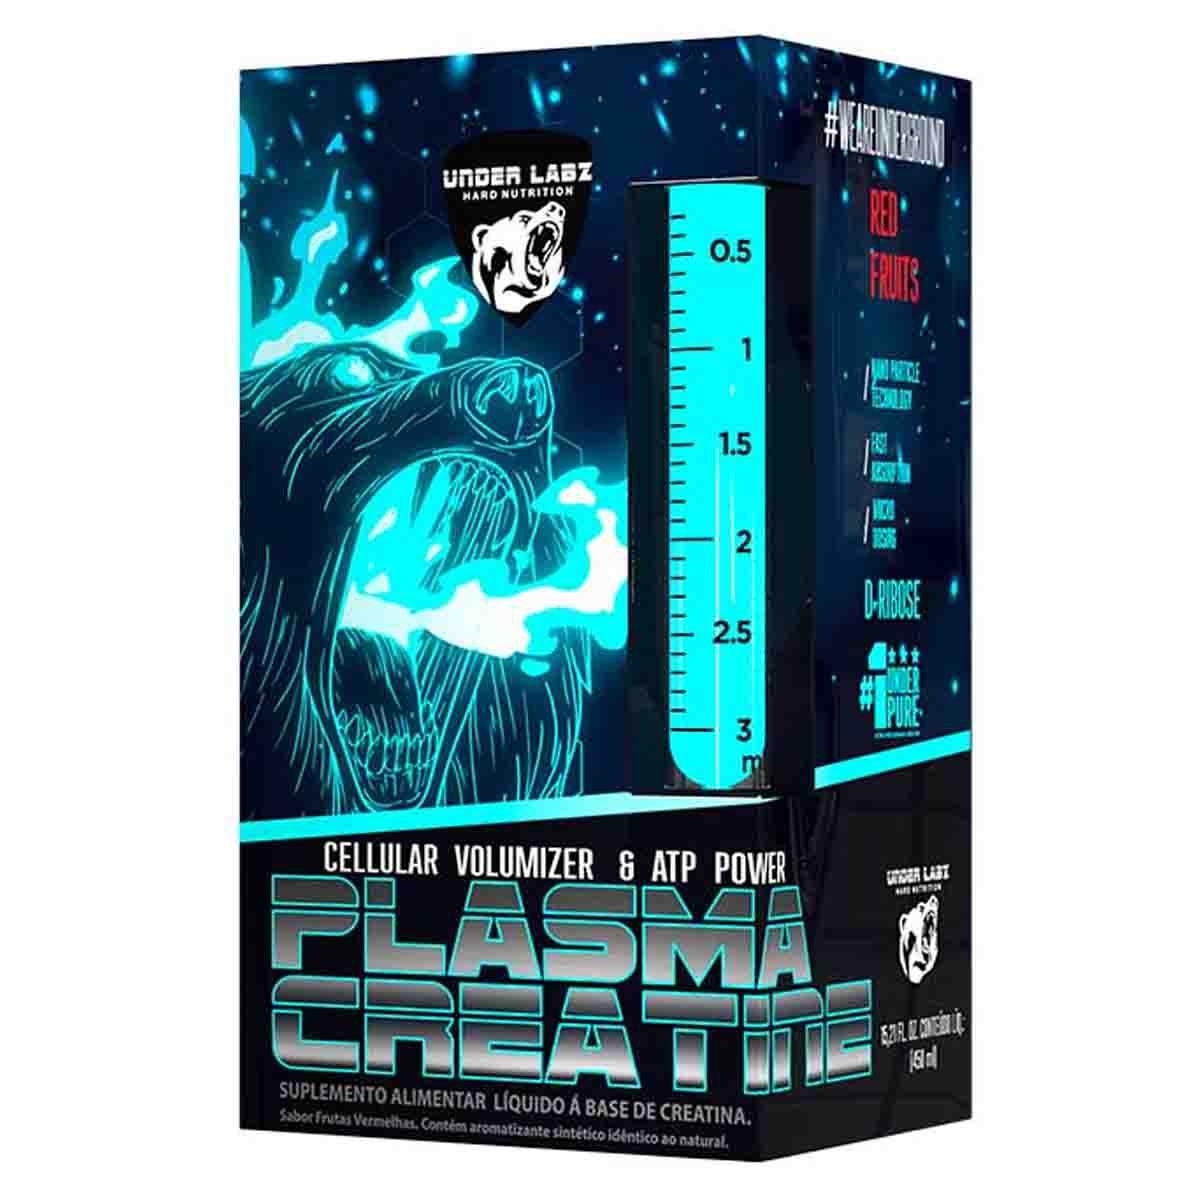 Plasma Creatine 450ml 30 doses - Under Labz